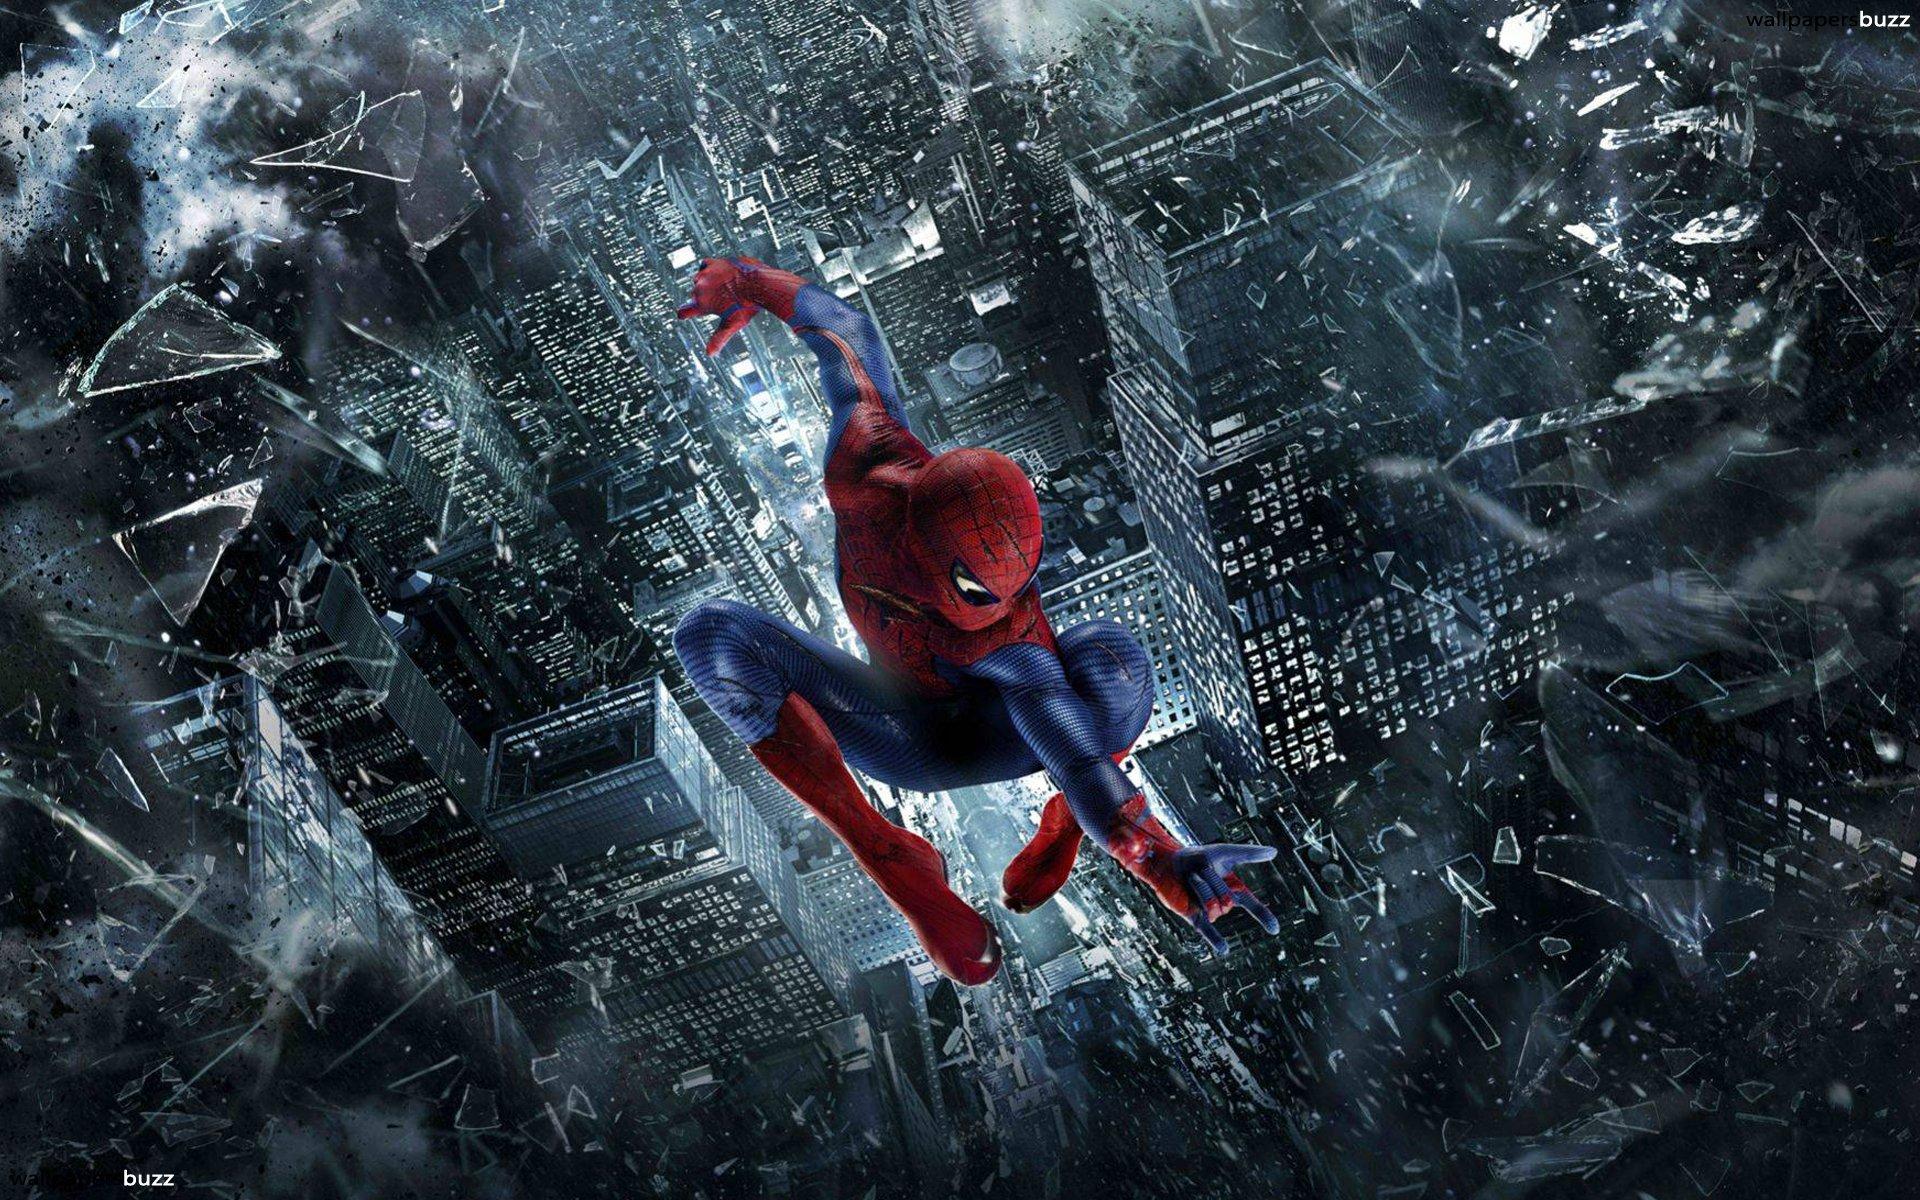 Spiderman-Jumping-HD-Wallpaper